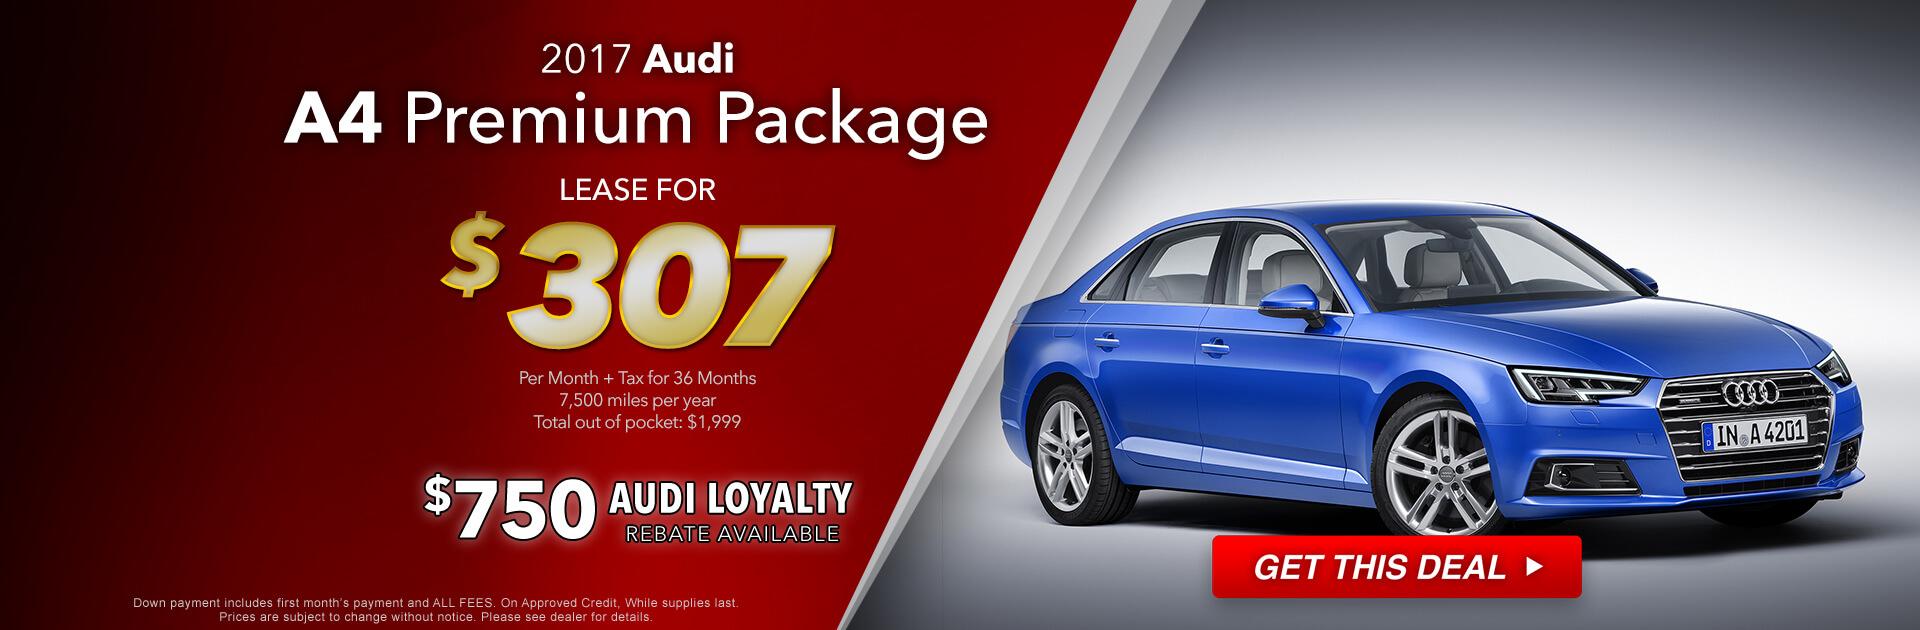 2017 Audi A4 Lease